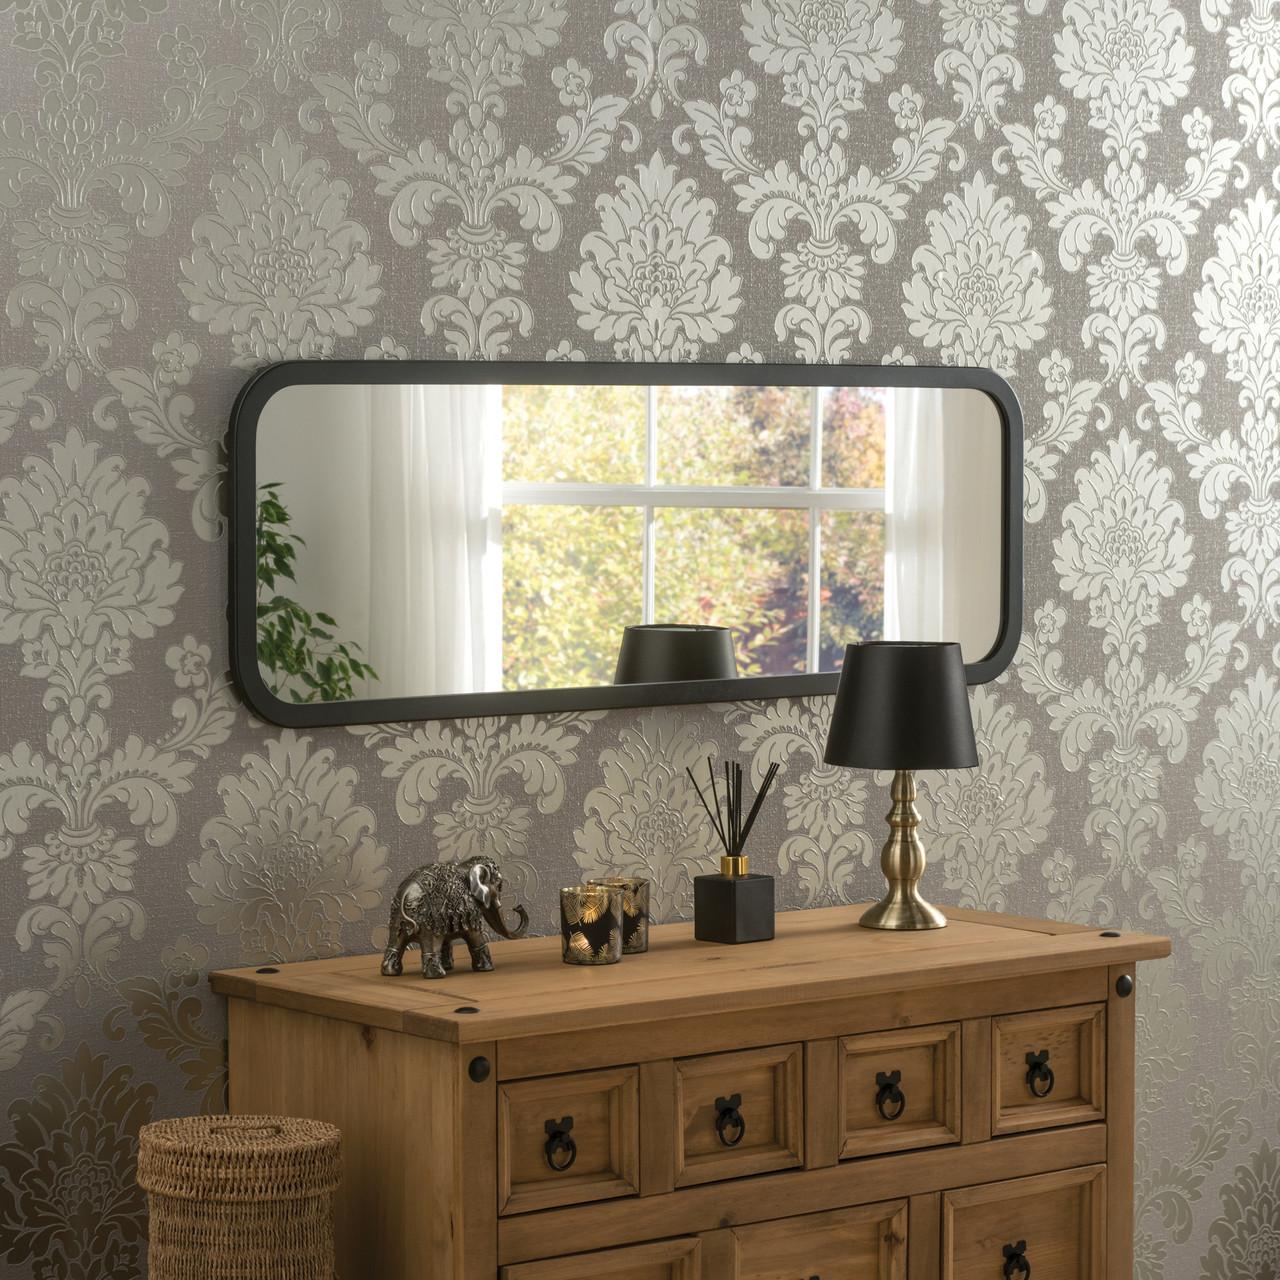 Image of Modern Black Oblong Mirror